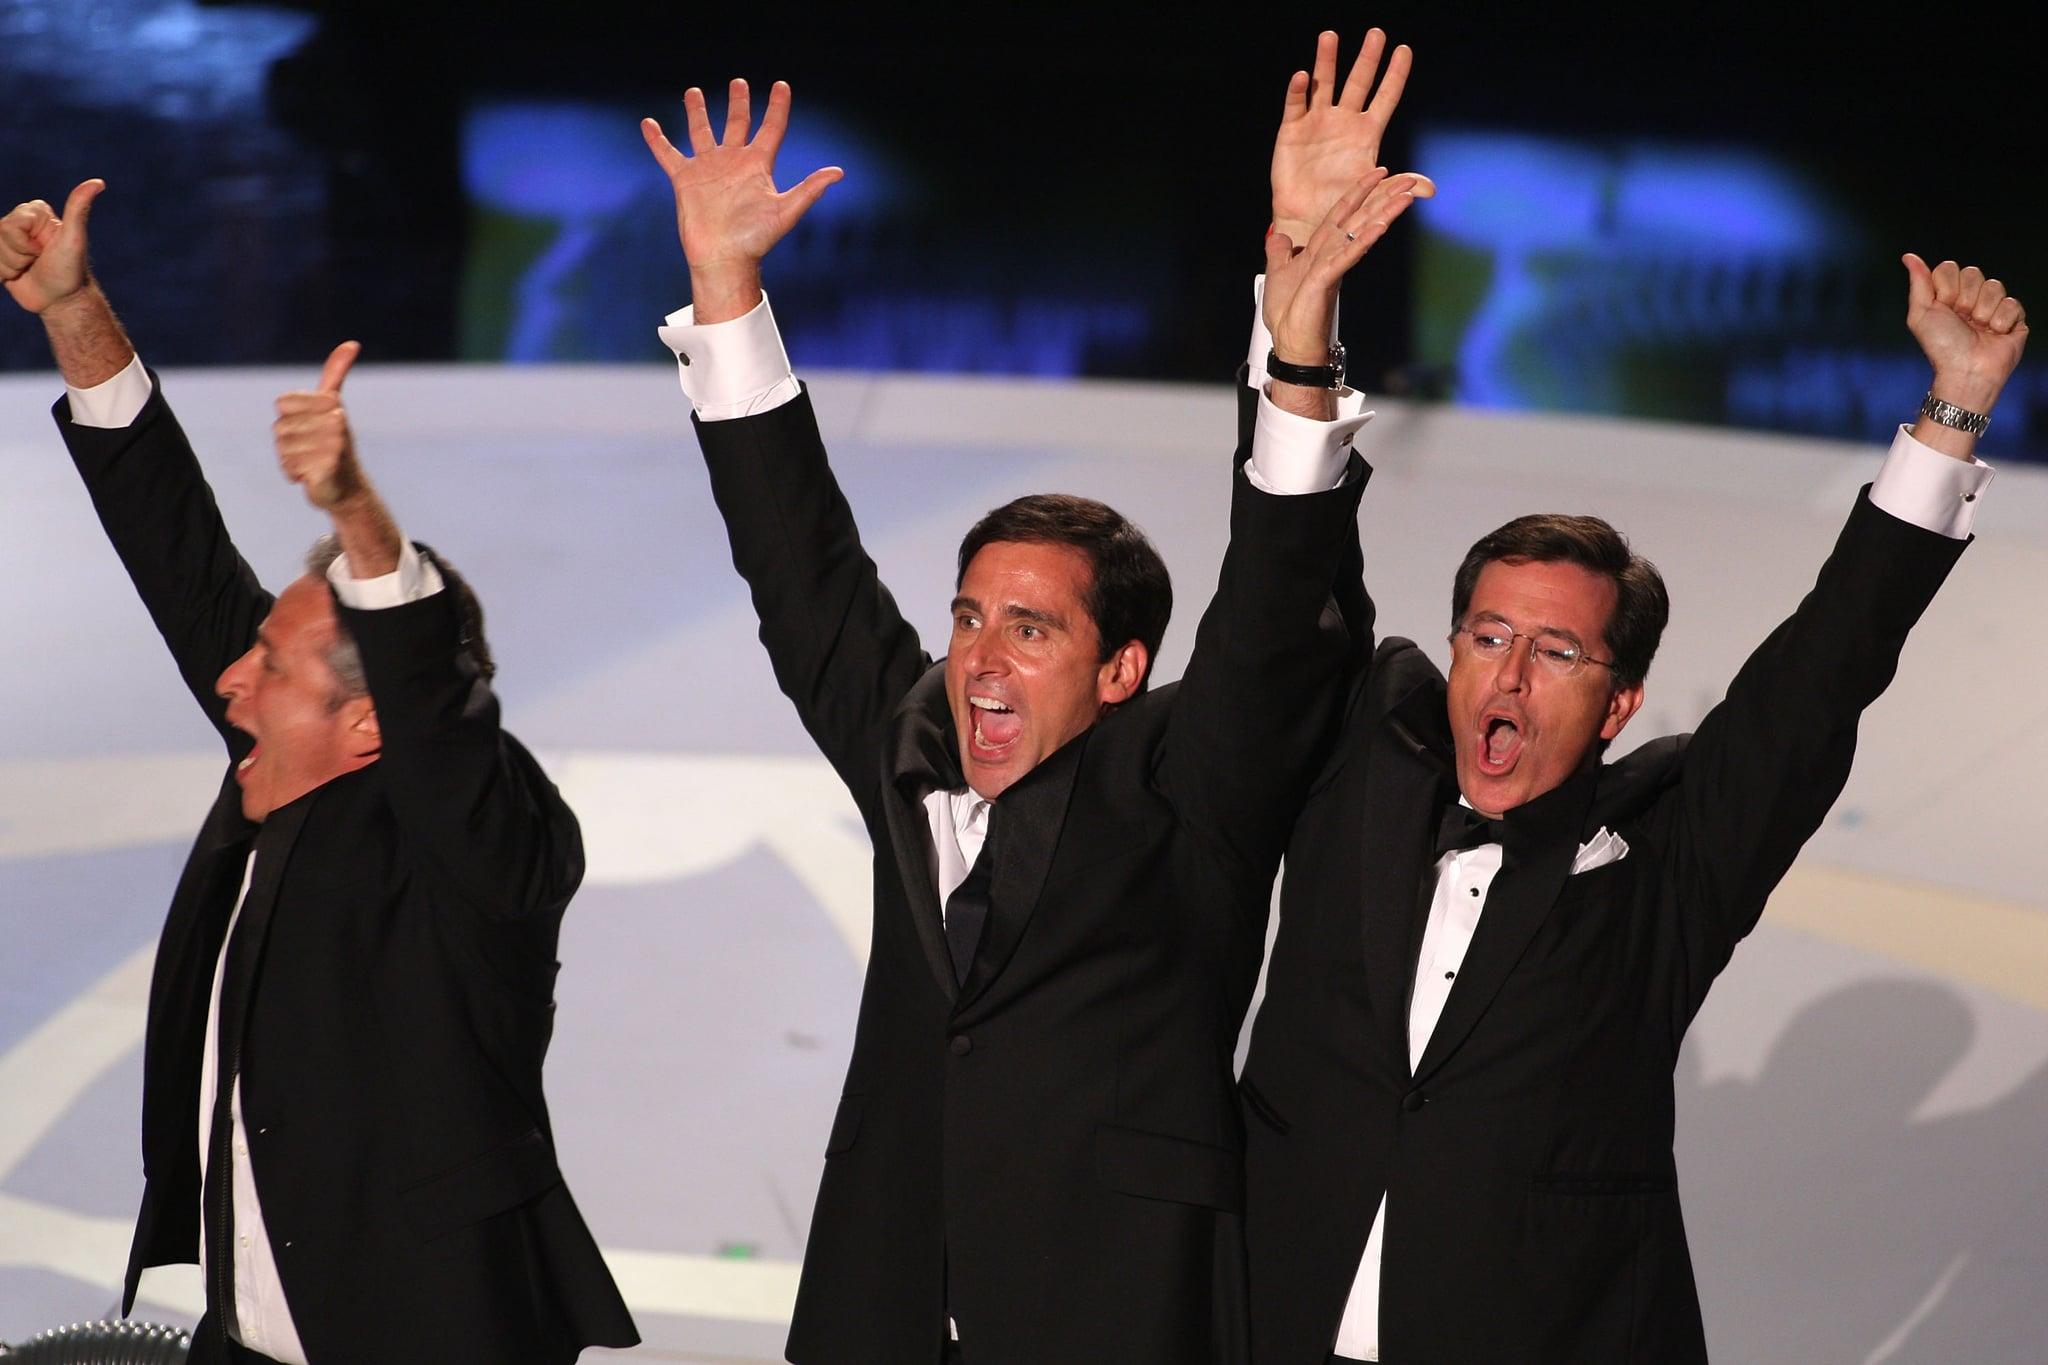 Jon Stewart, Stephen Colbert, and Steve Carell joked around in 2007.